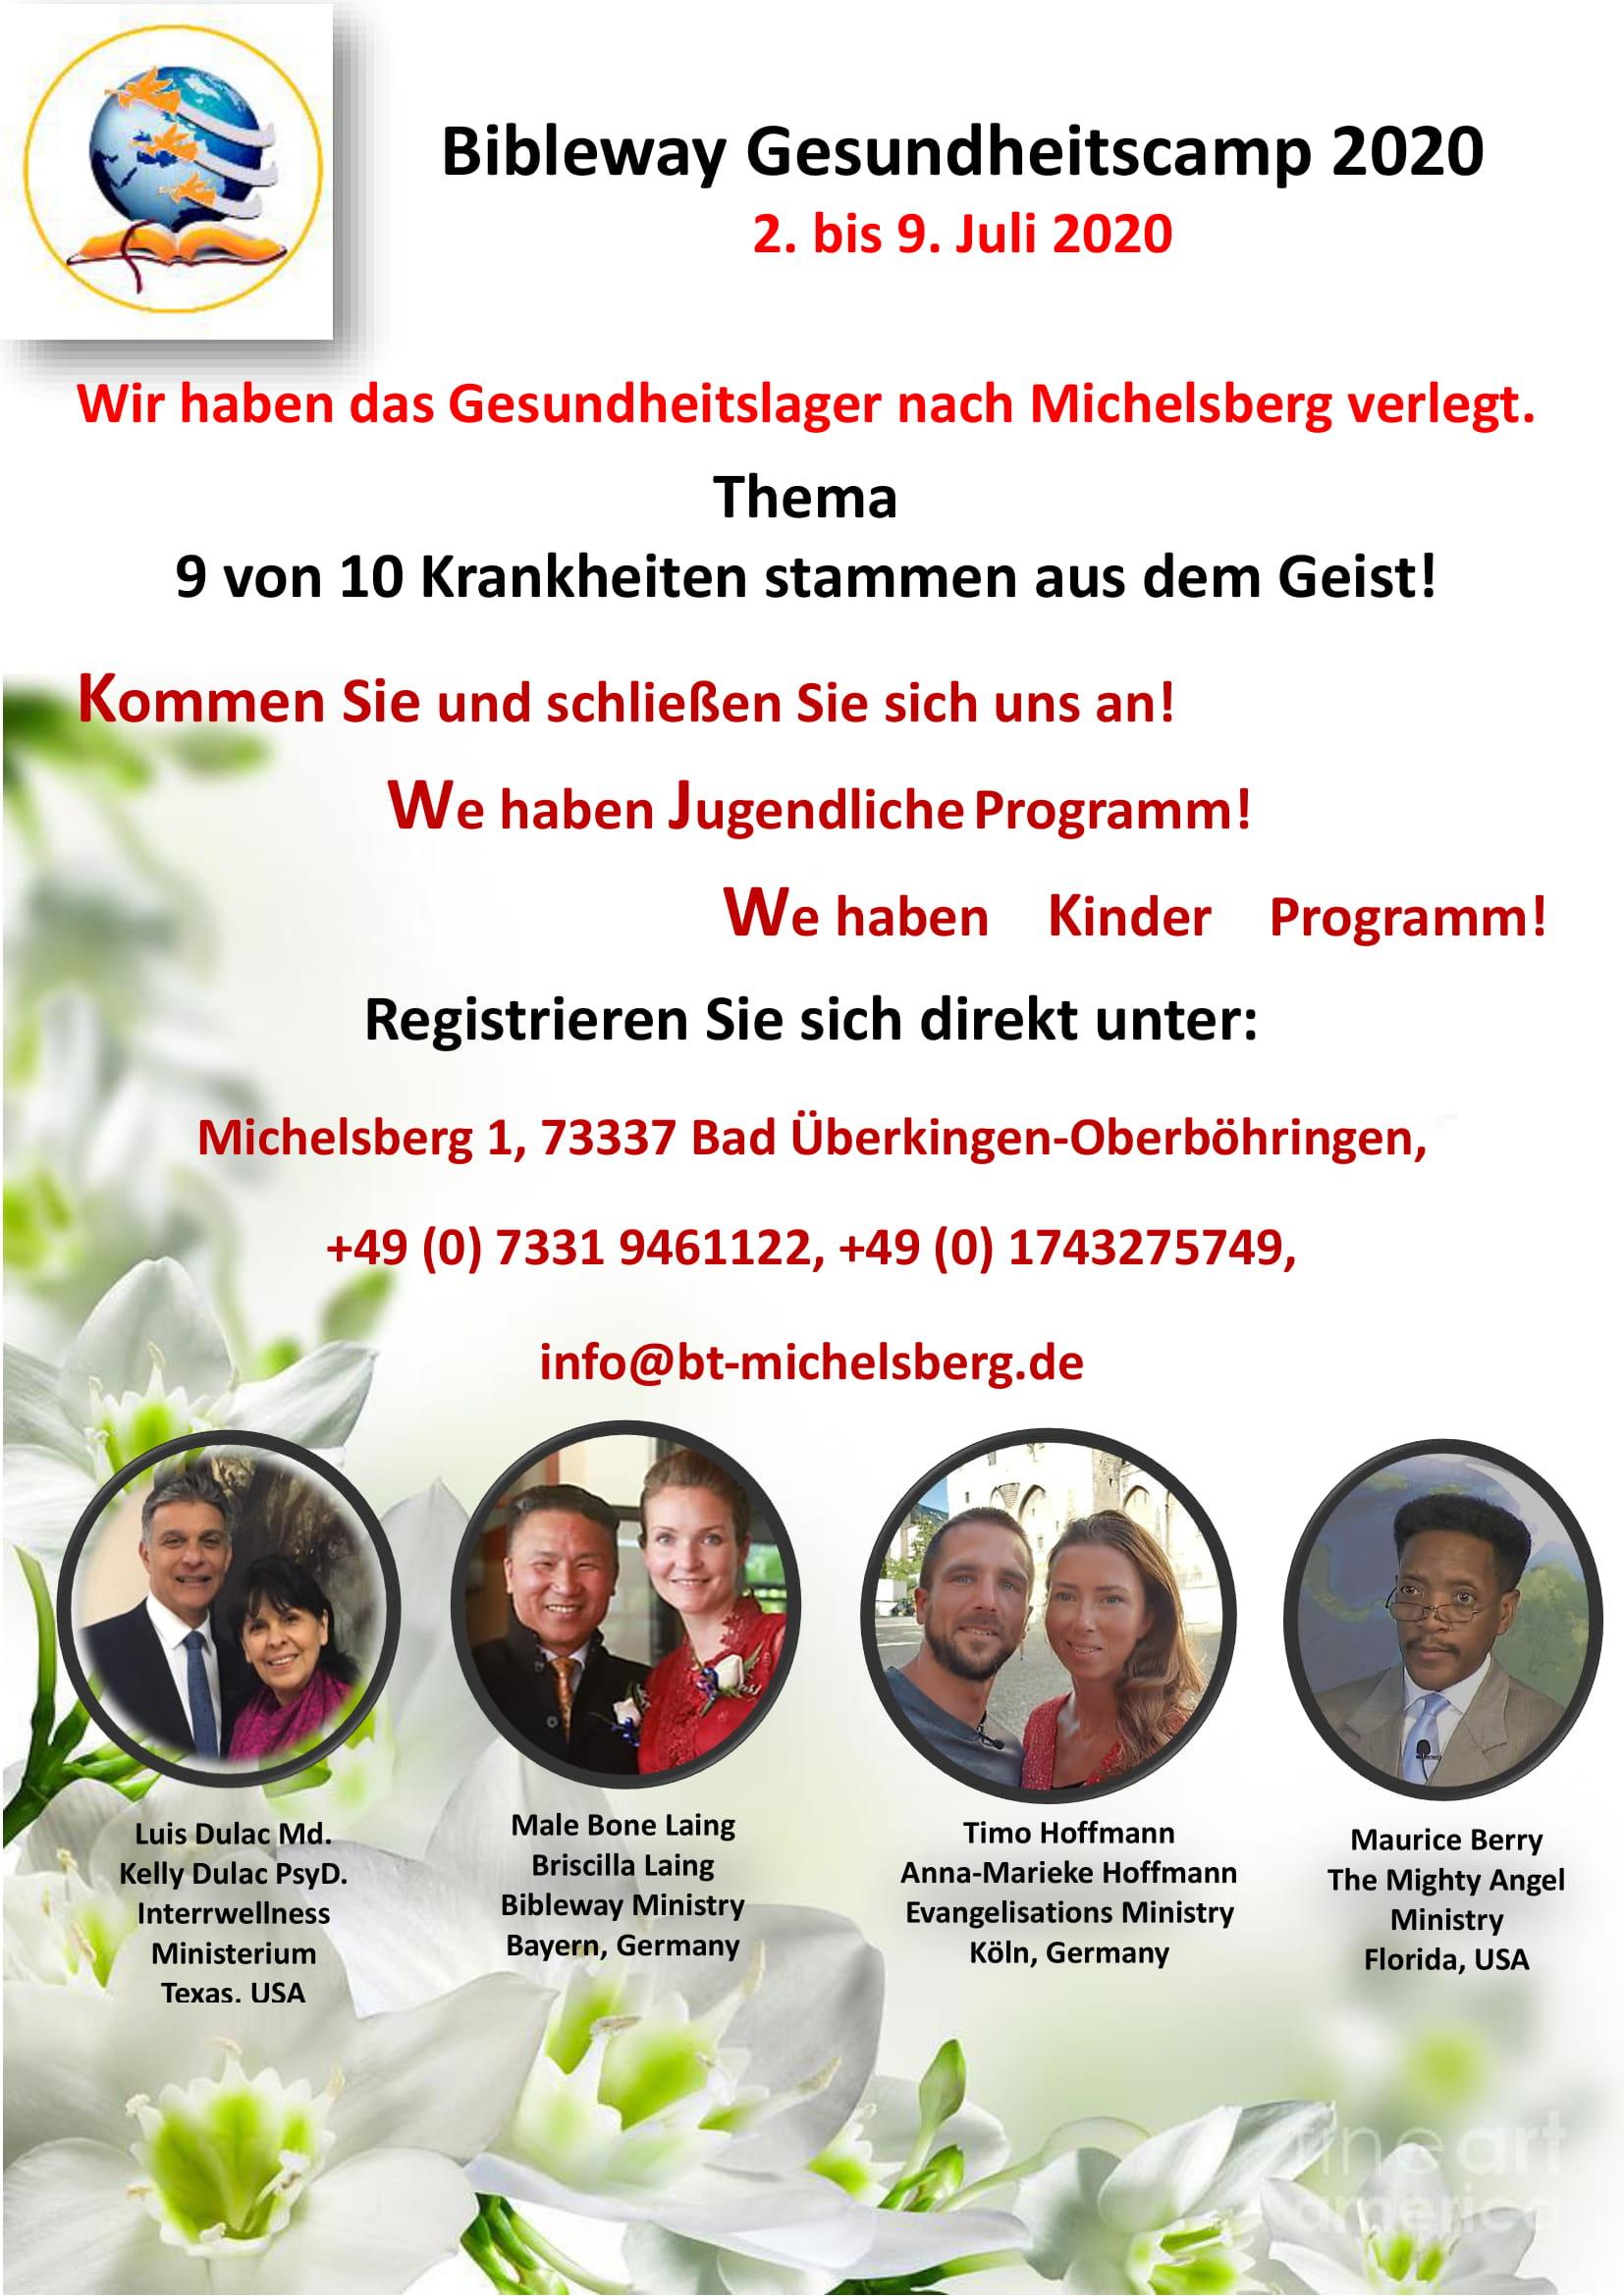 Michelsberg-Gesundheits-Camp-2020-de